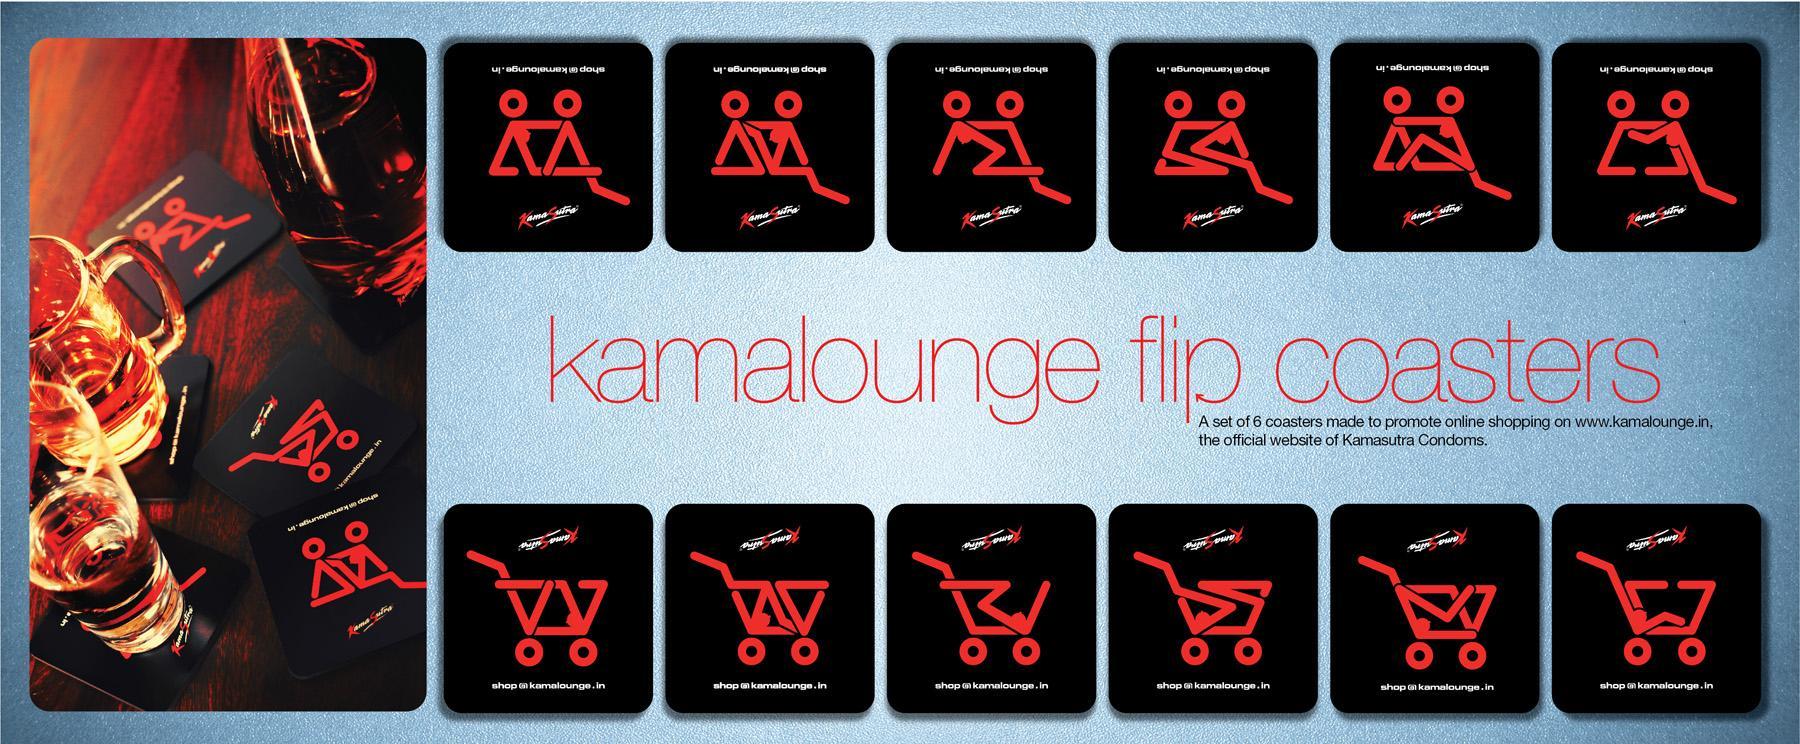 Kamasutra Direct Ad -  Kamalounge Flip Coasters